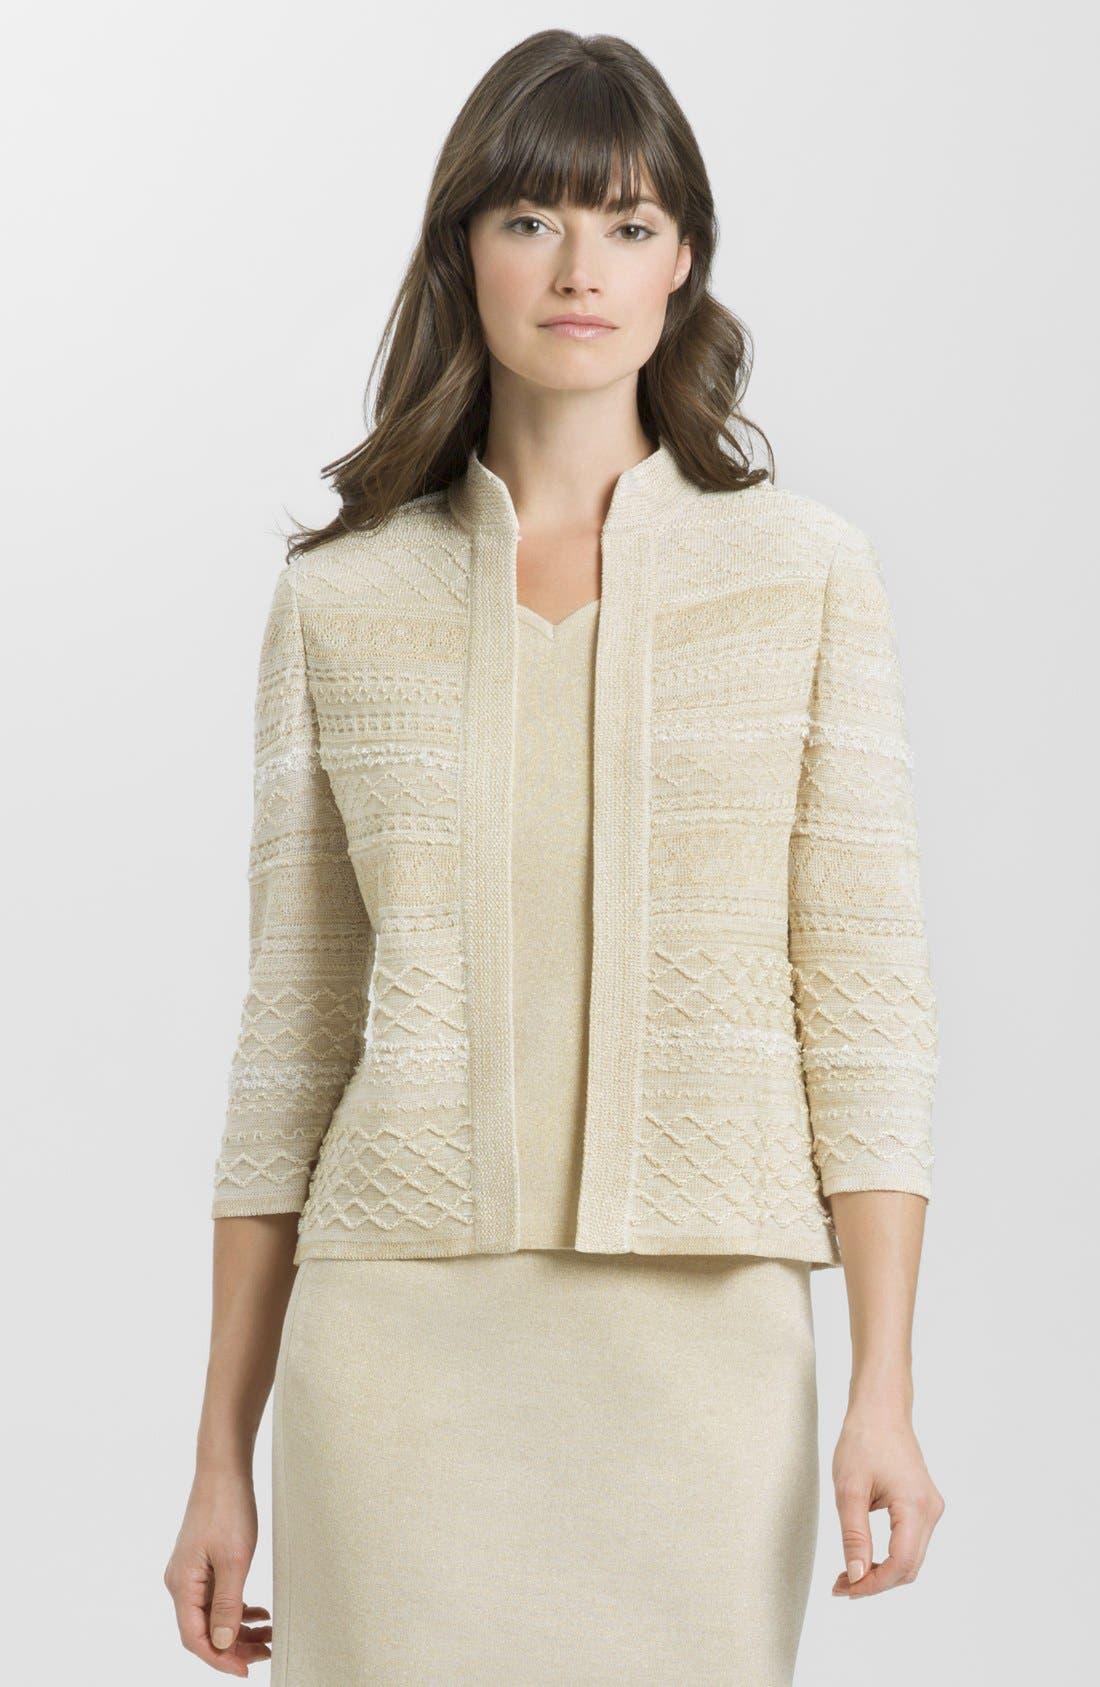 Alternate Image 1 Selected - Ming Wang Mixed Knit Three Quarter Sleeve Jacket